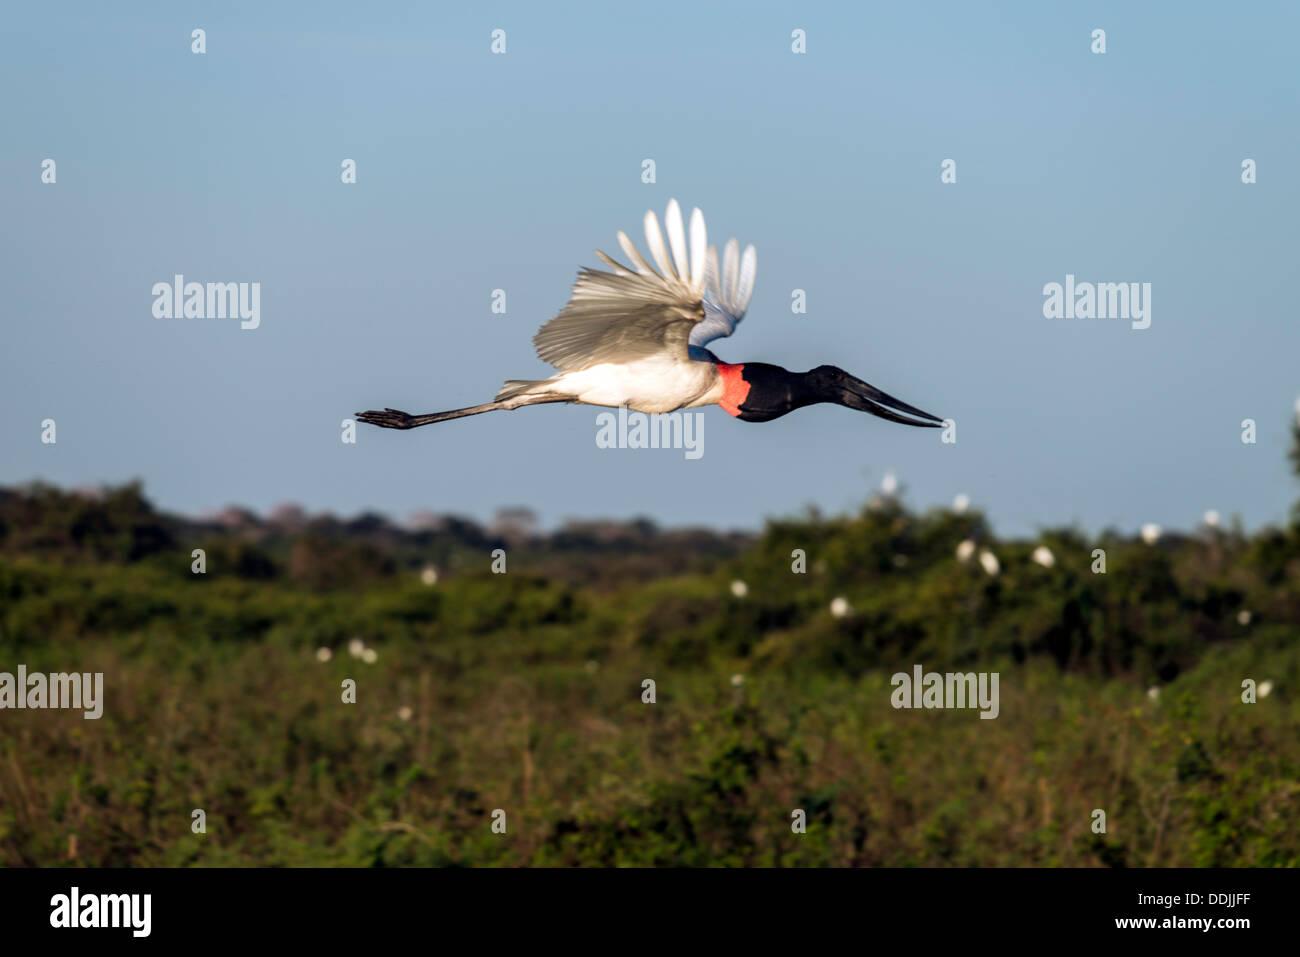 Jabiru Storch Jabiru Mycteria Vögel im Flug Pantanal Mato Grosso Brasilien Südamerika Stockbild